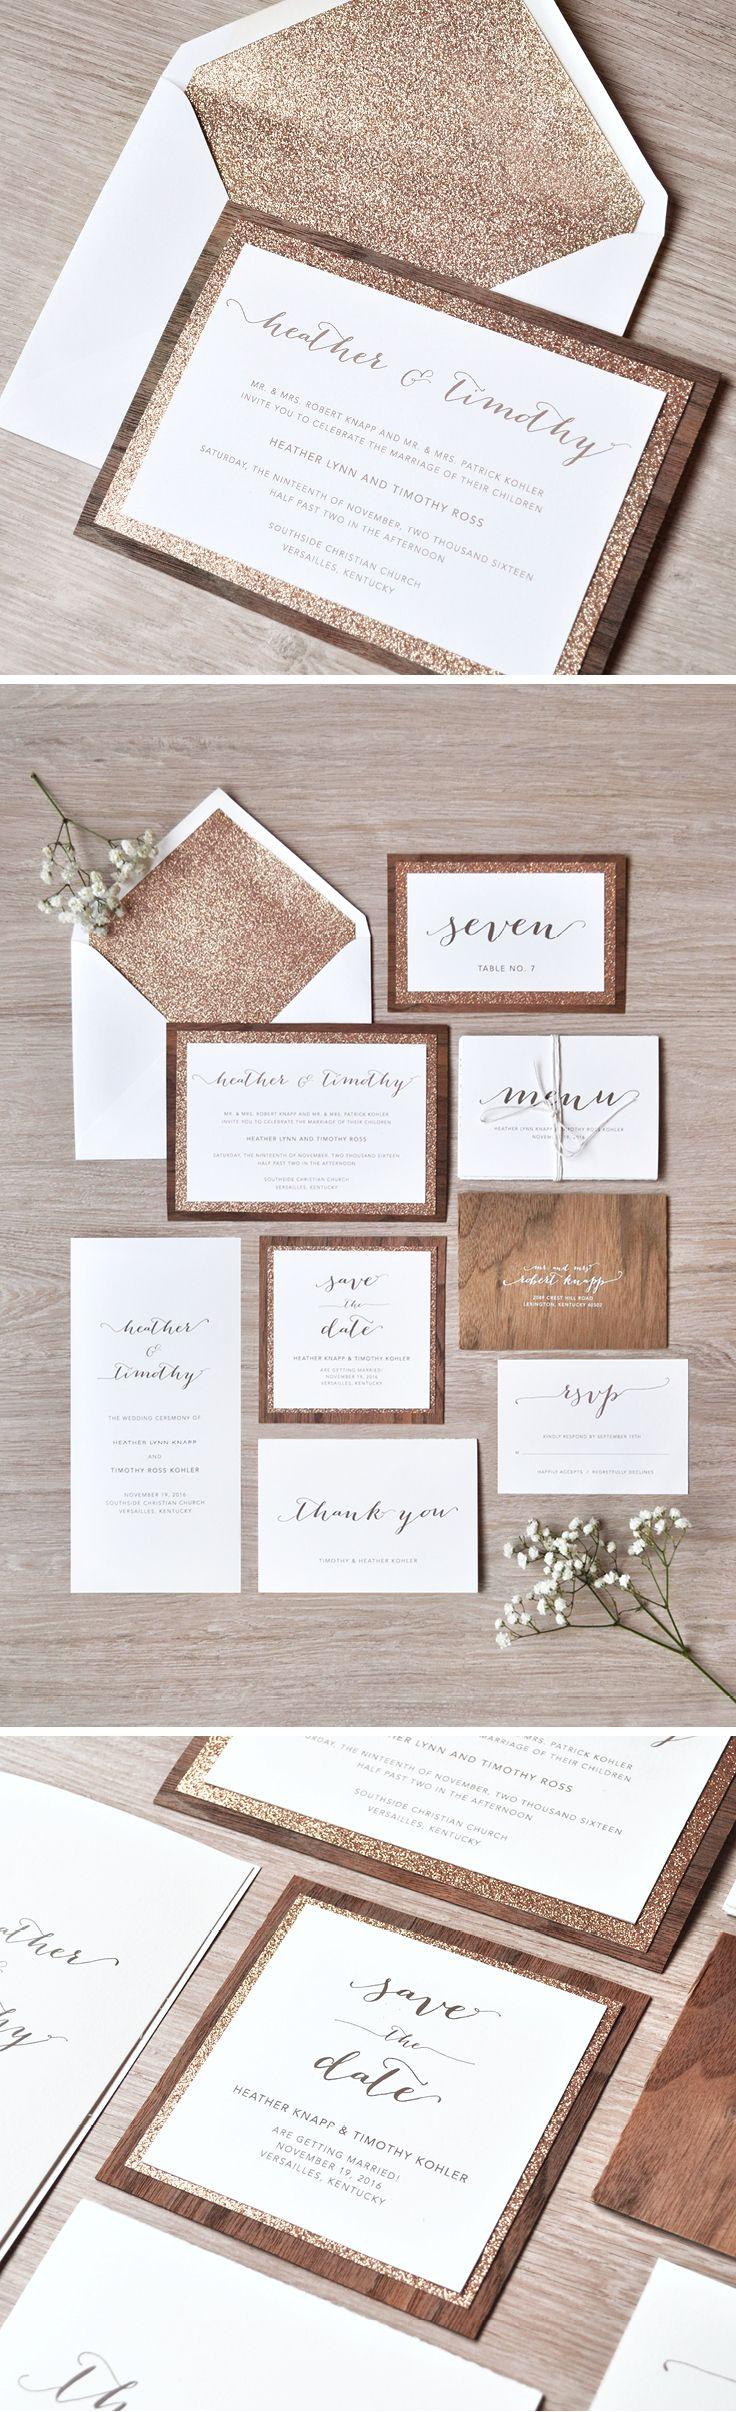 Rustic Wedding Invitation - Heather Wedding Invitation | Pinterest ...